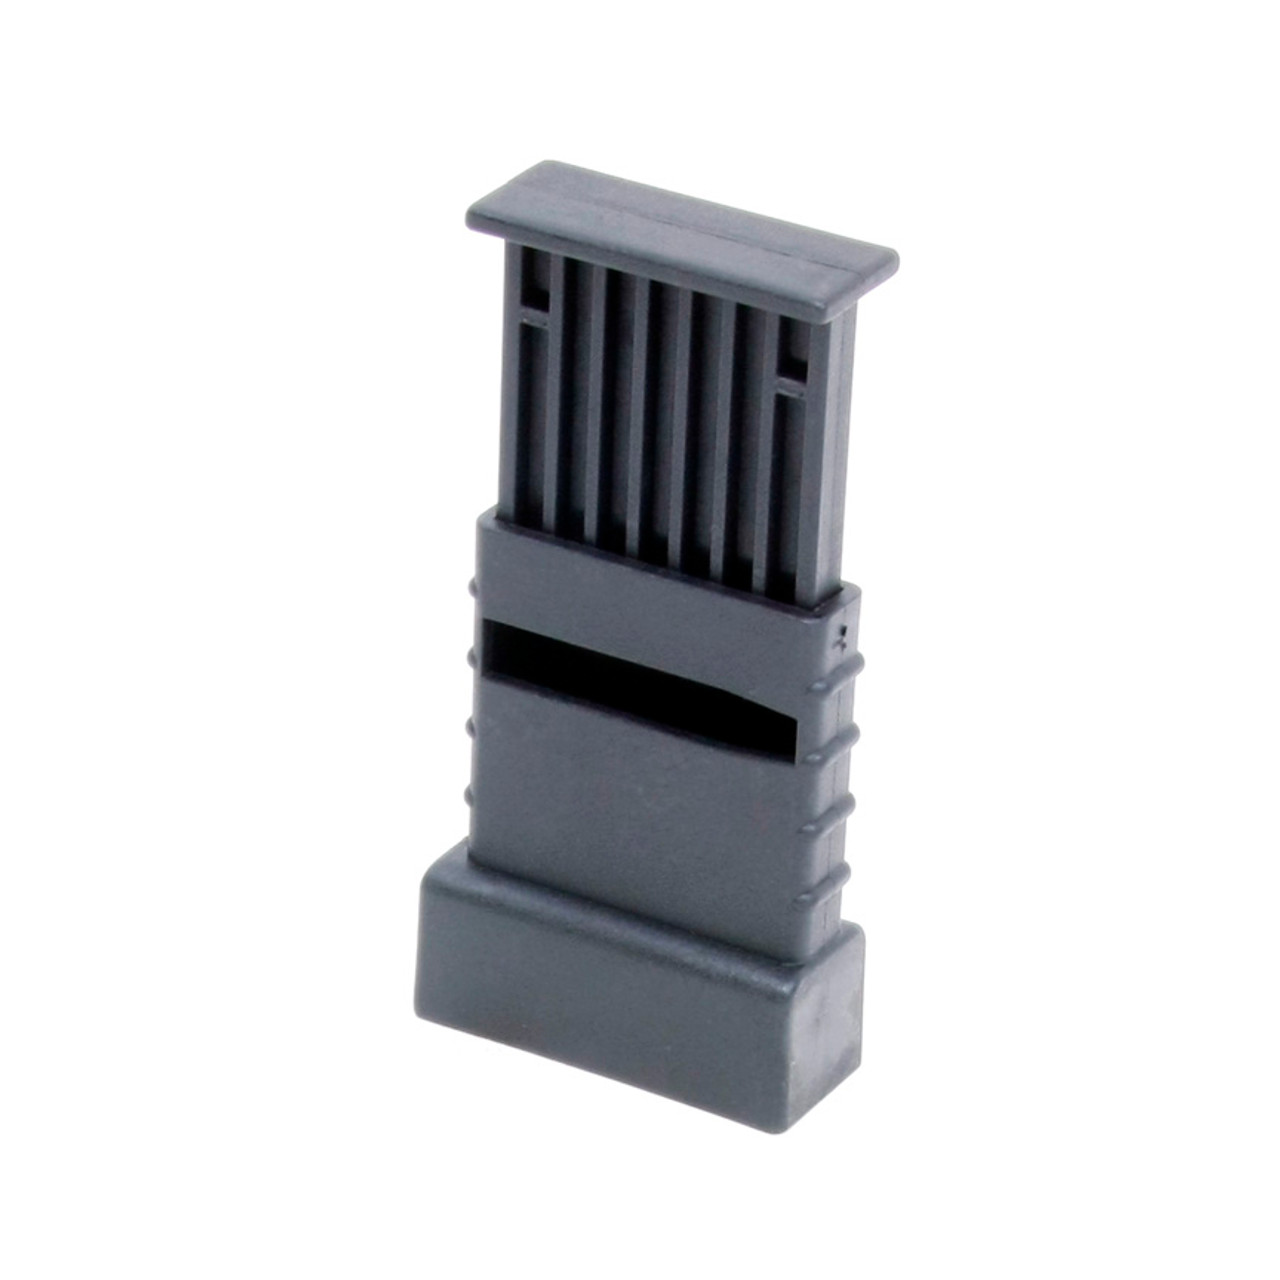 AR-15® / M16 (5) Rd USGI Magazine Loader - Black Polymer